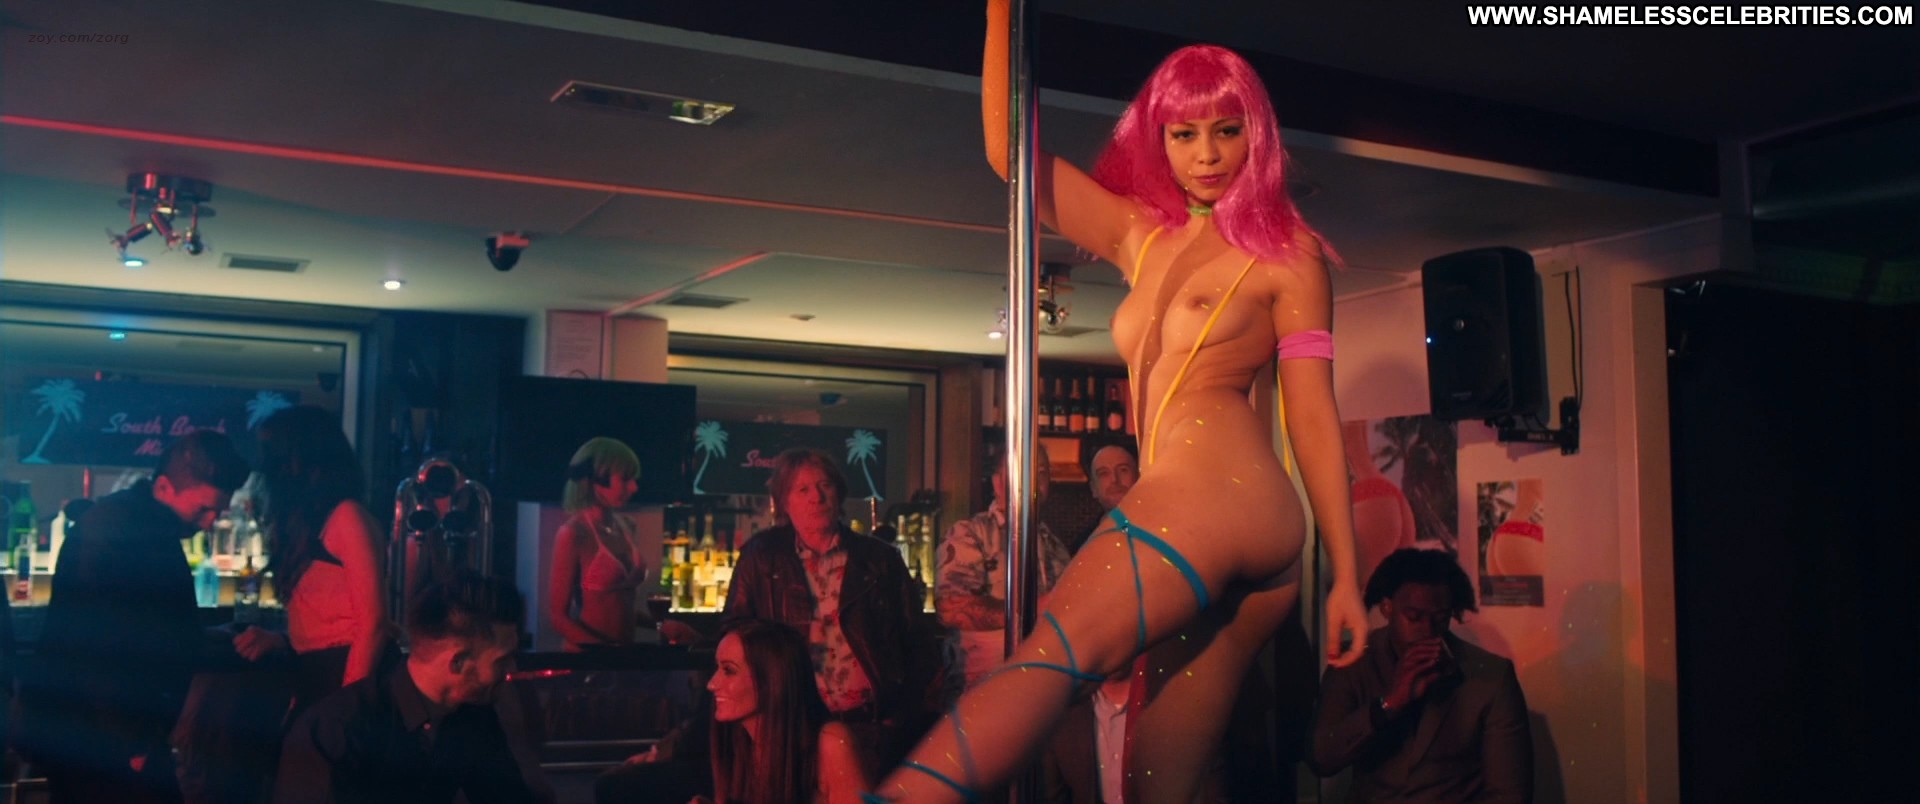 Chloe Goodman Emma Rigby Plastic Celebrity Posing Hot Nude Bikini Topless Hot Sex